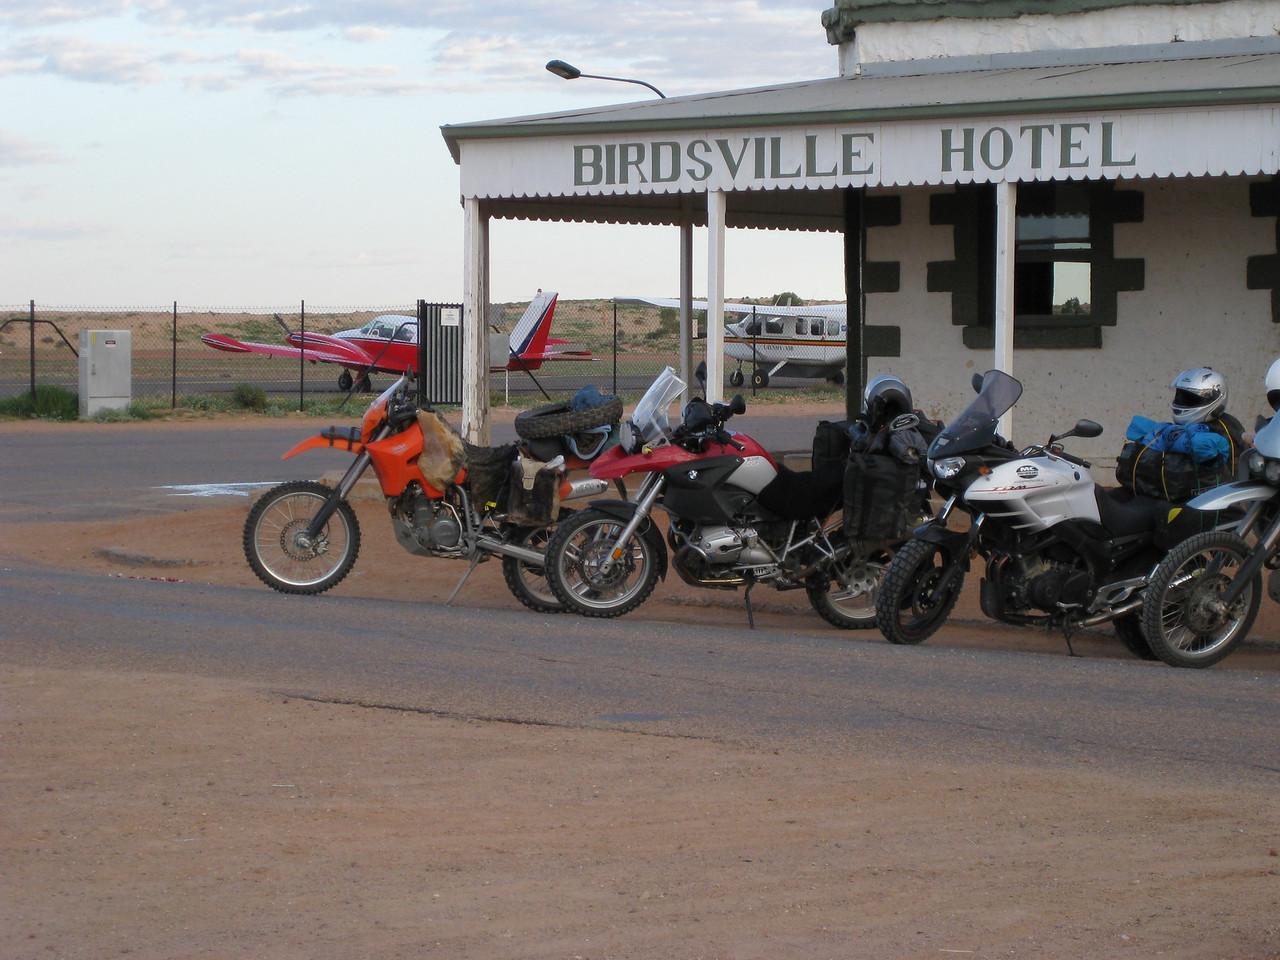 Birdsvill Hotel and airport.